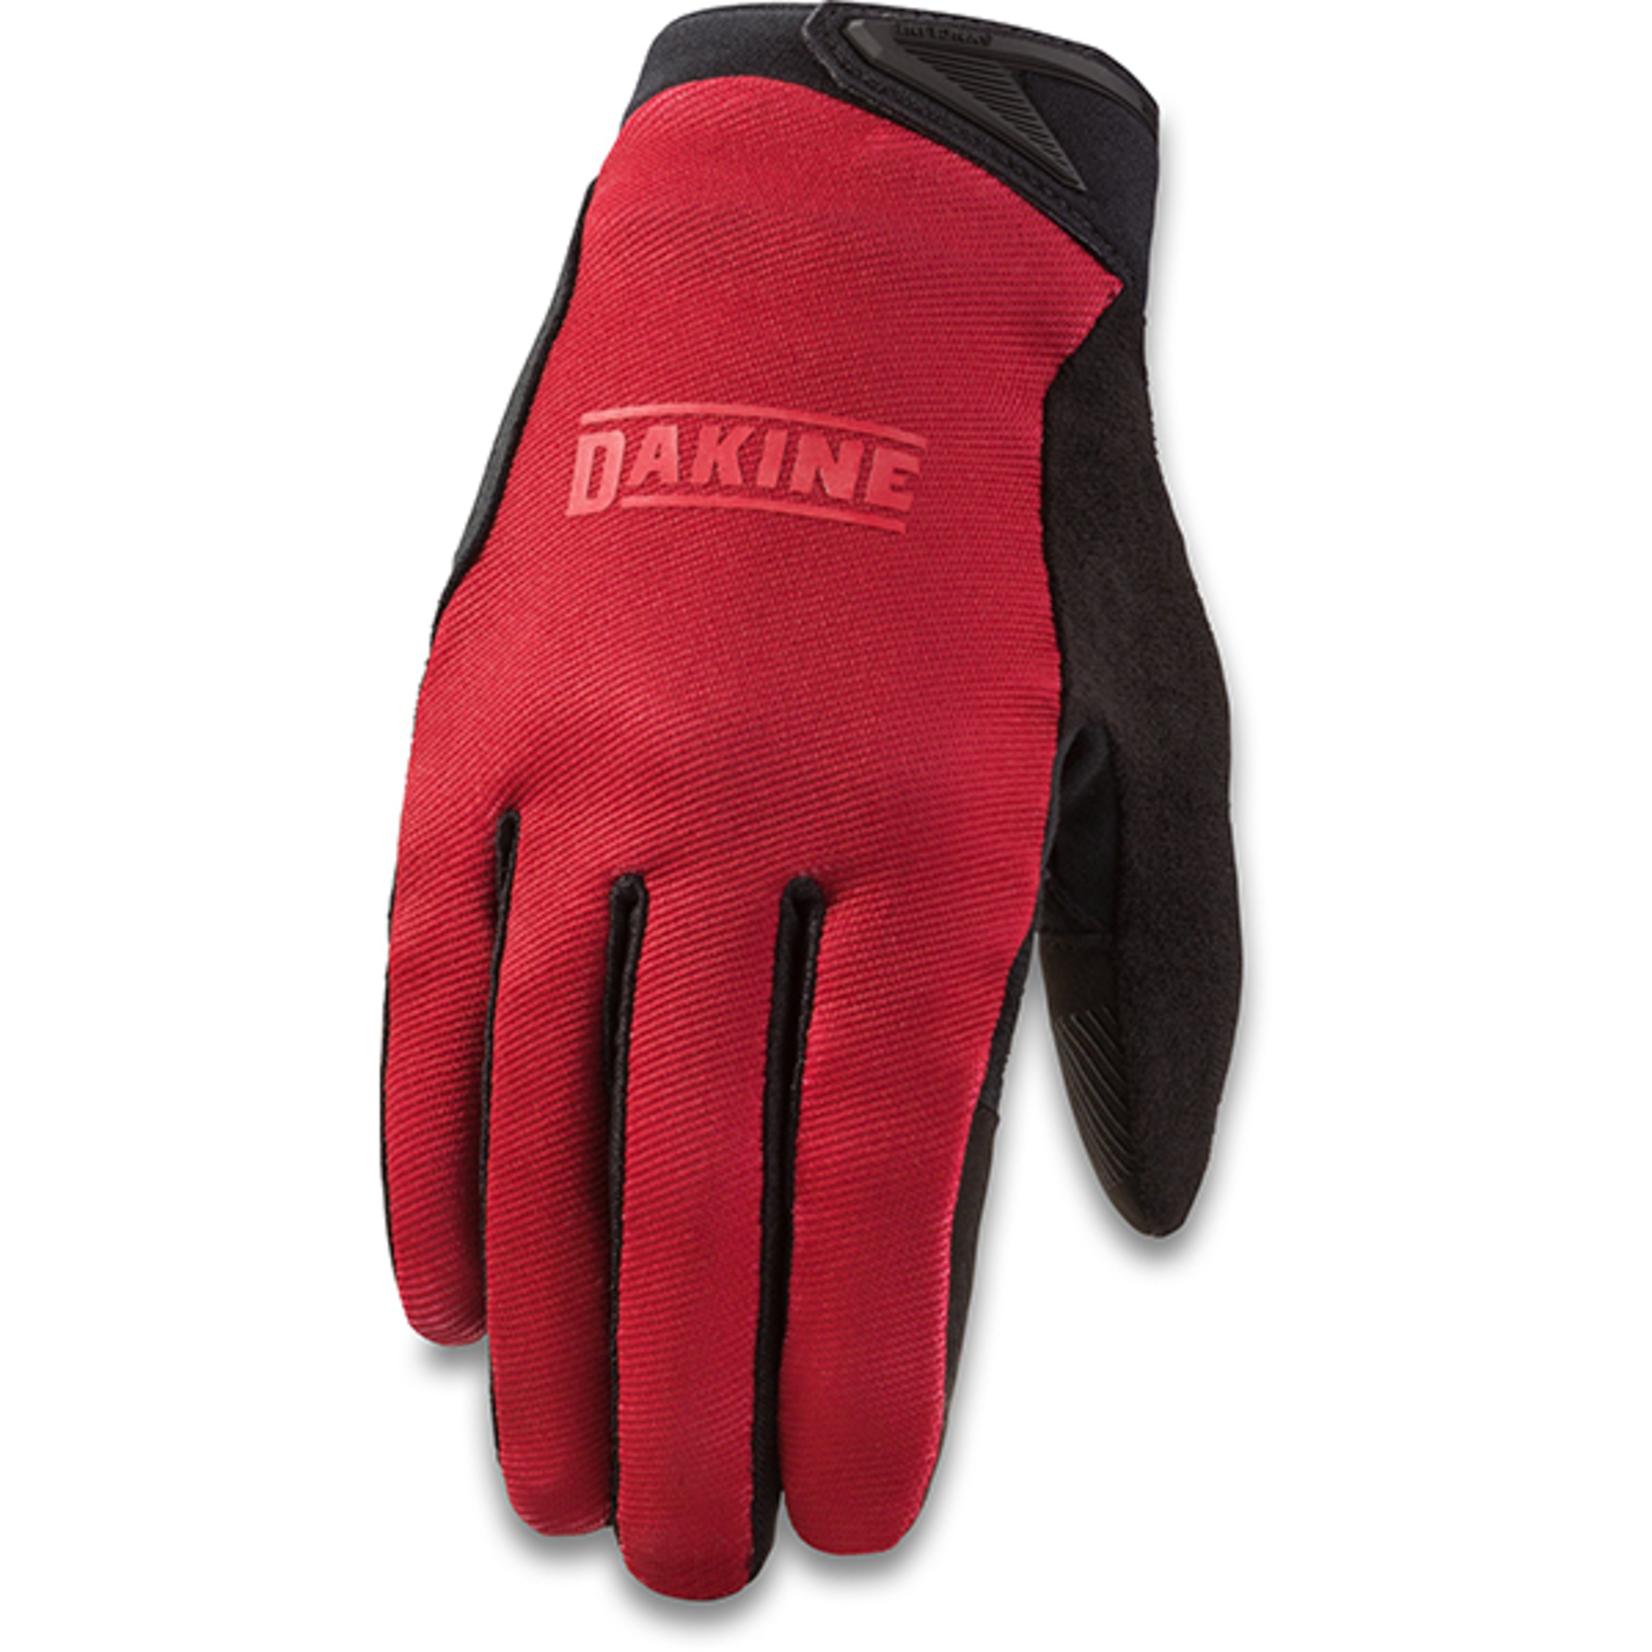 Dakine Syncline Gel Gloves